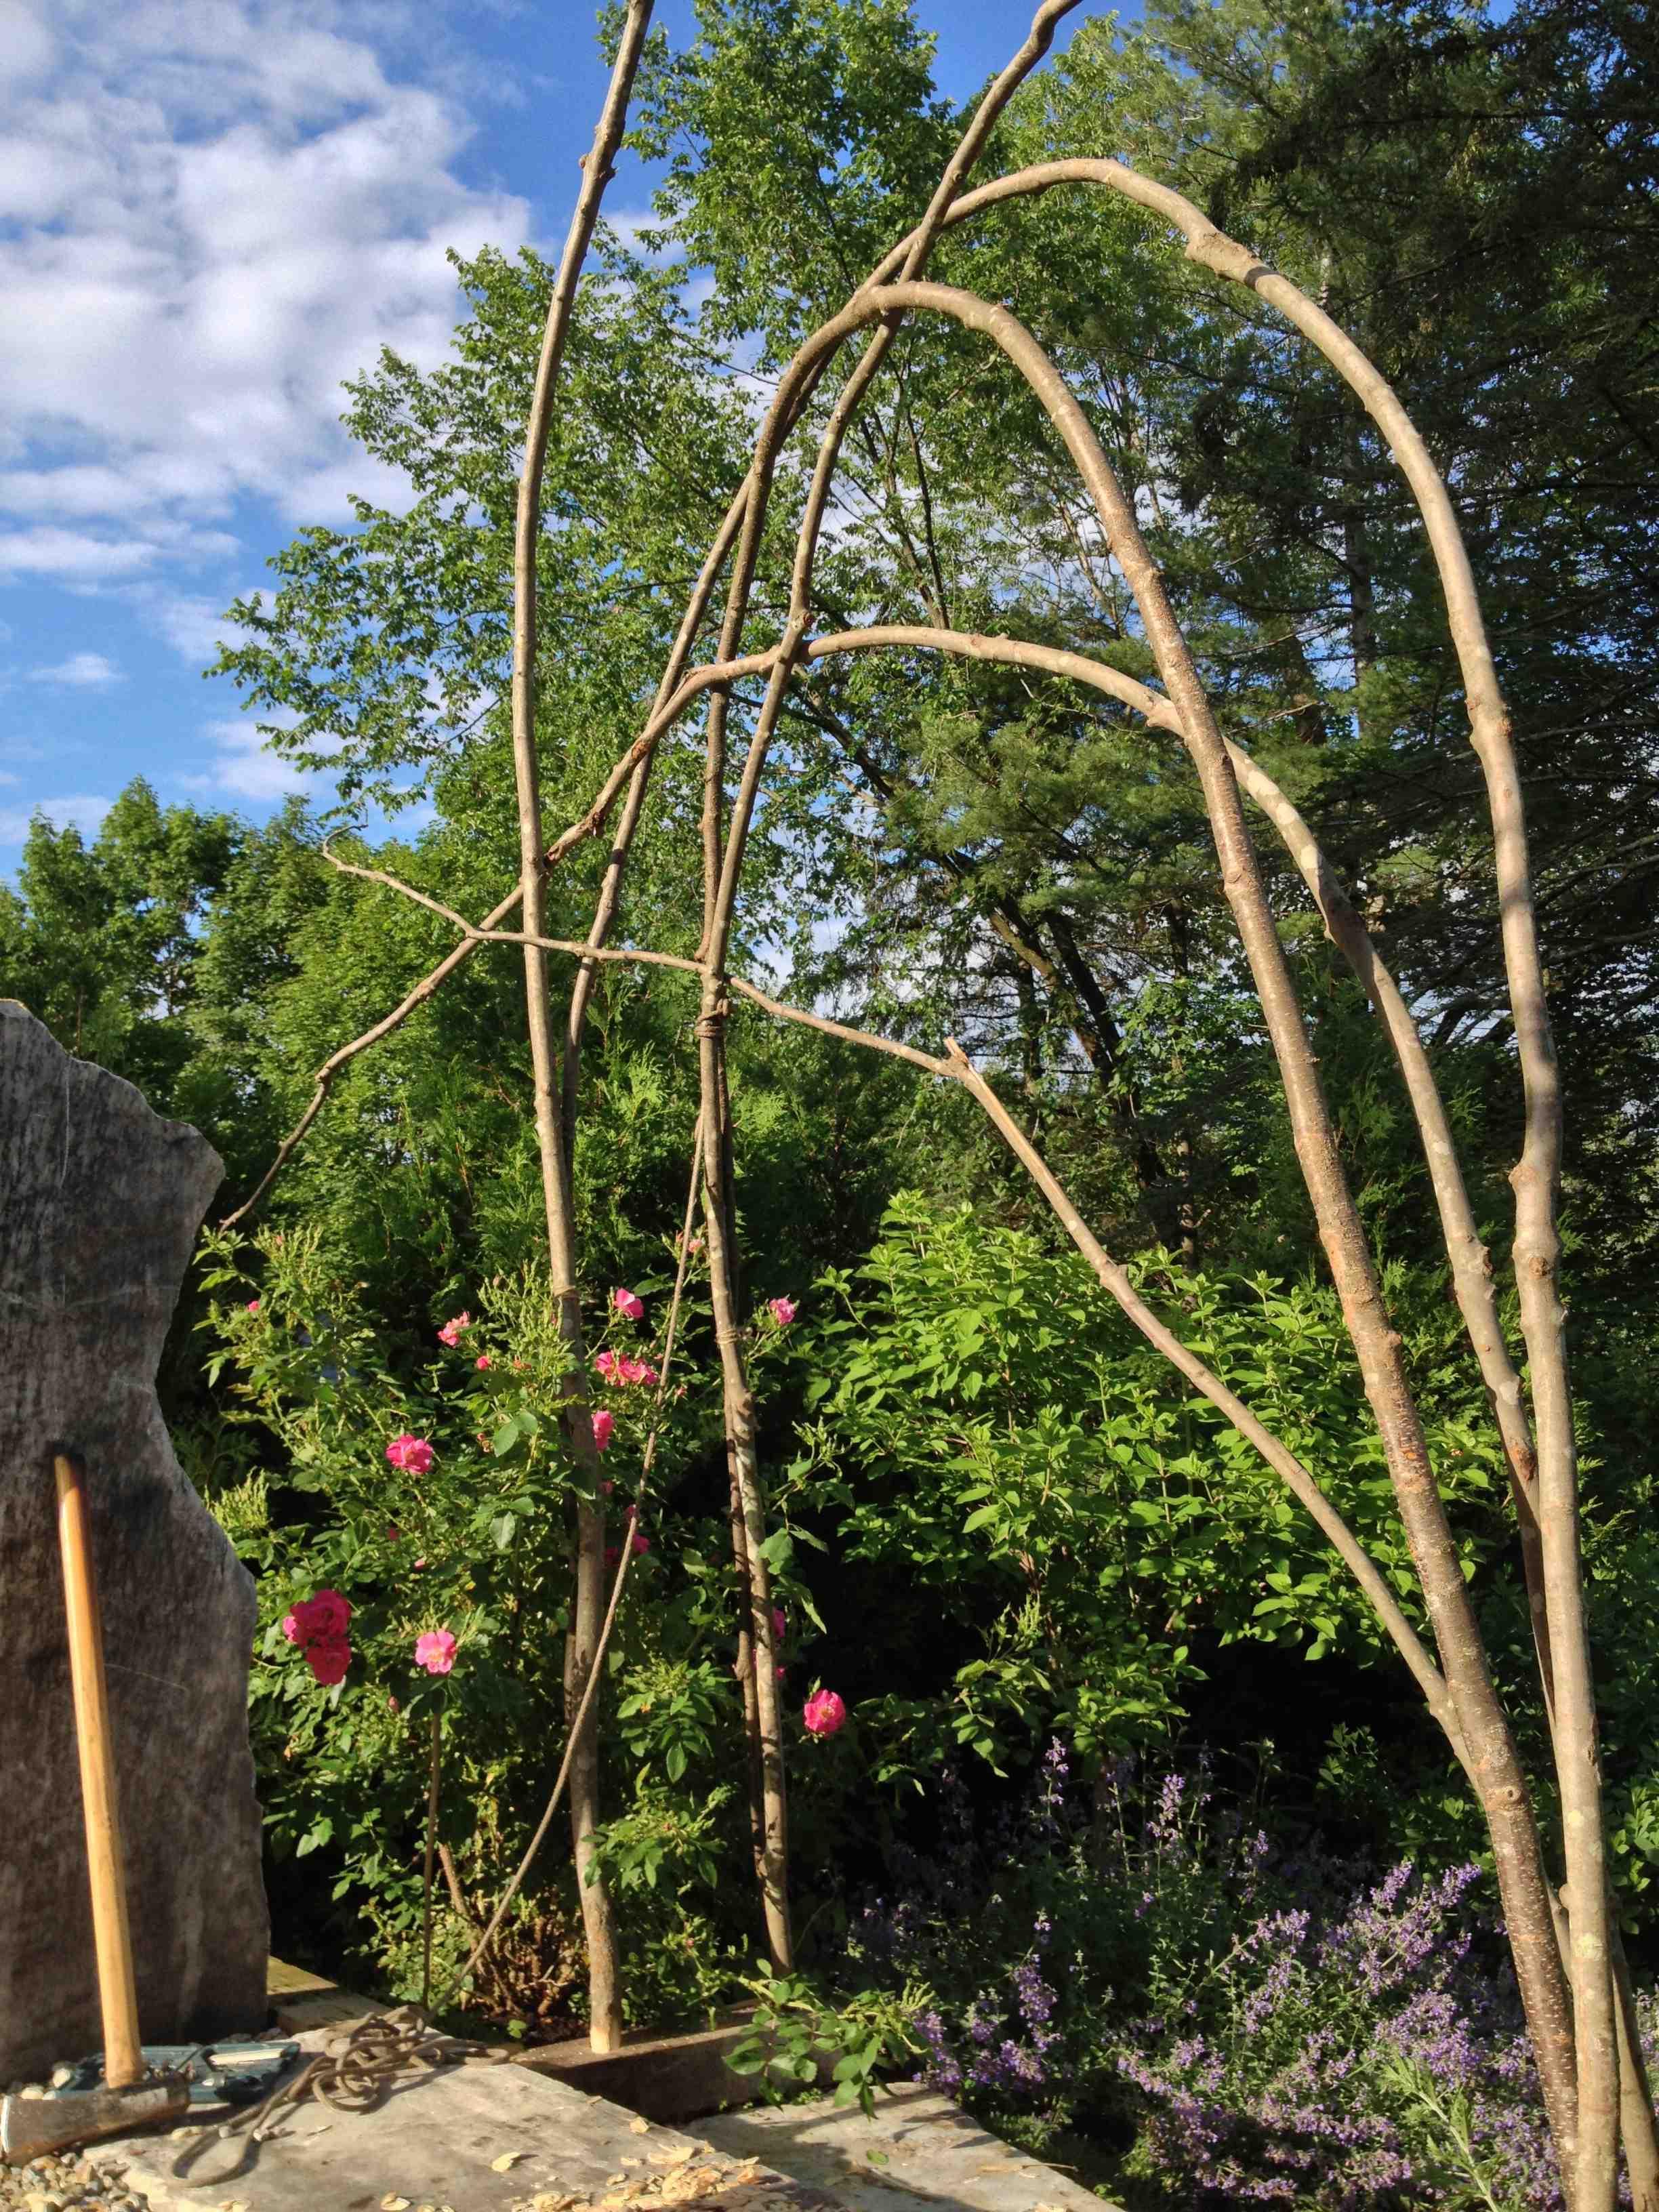 How to build a rustic trellis ellen ecker ogden for Wooden garden trellis designs